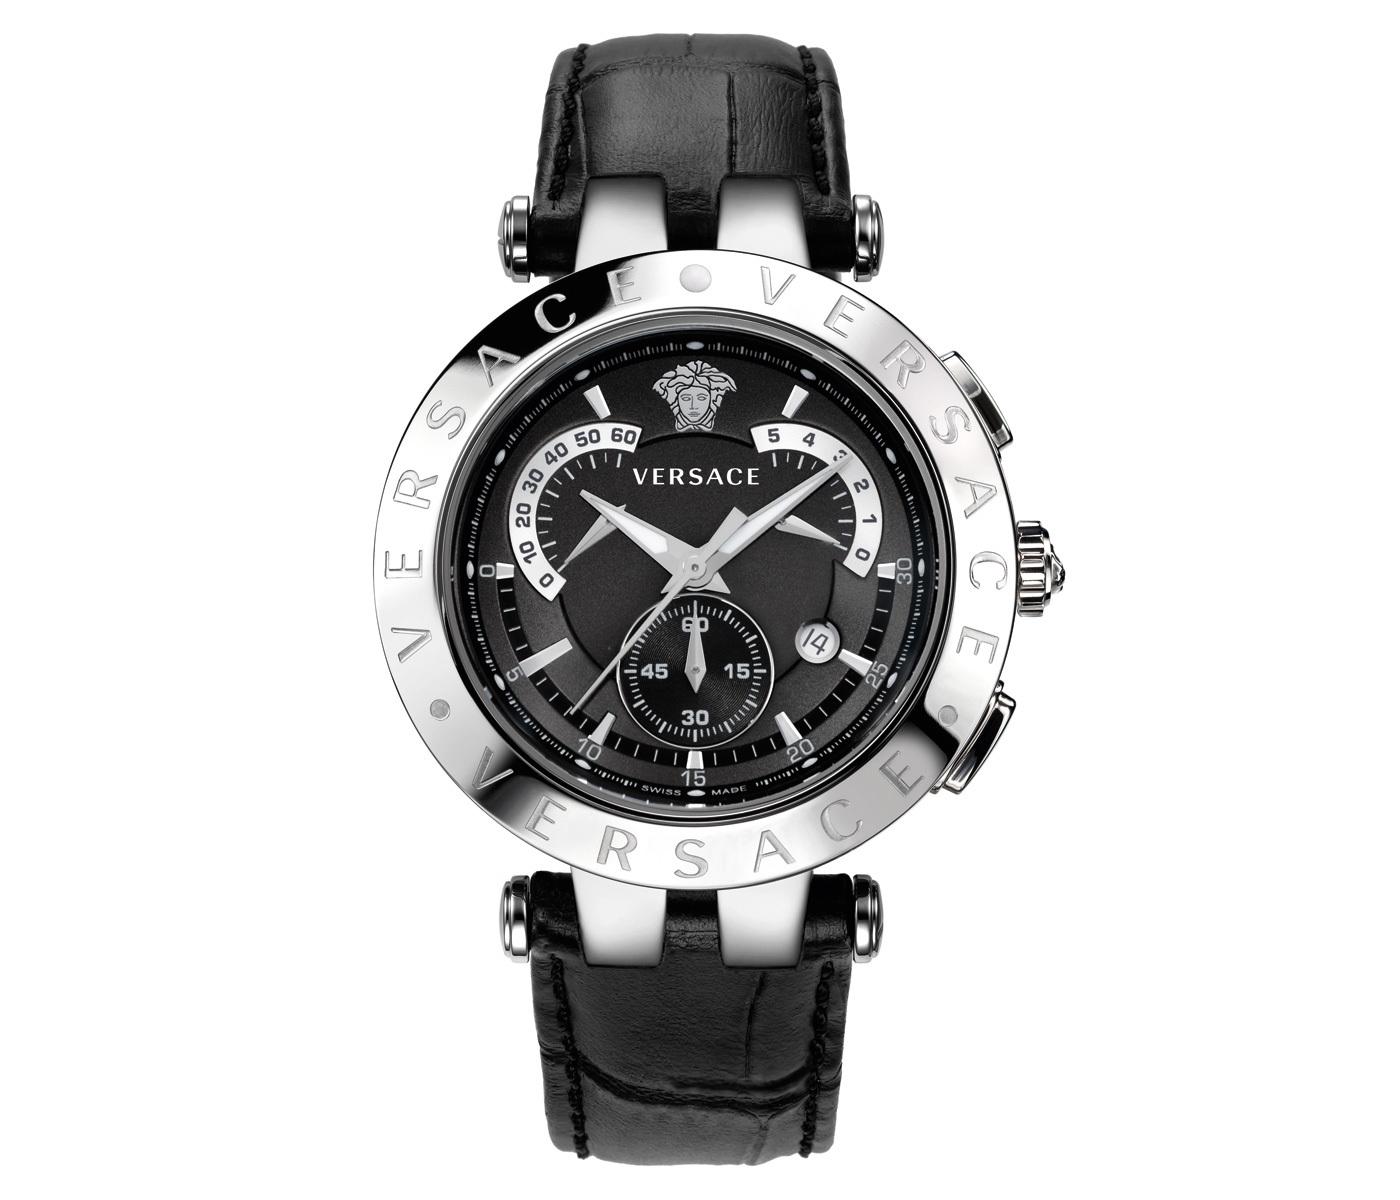 aabfec0dc457 relojes versace en mexico